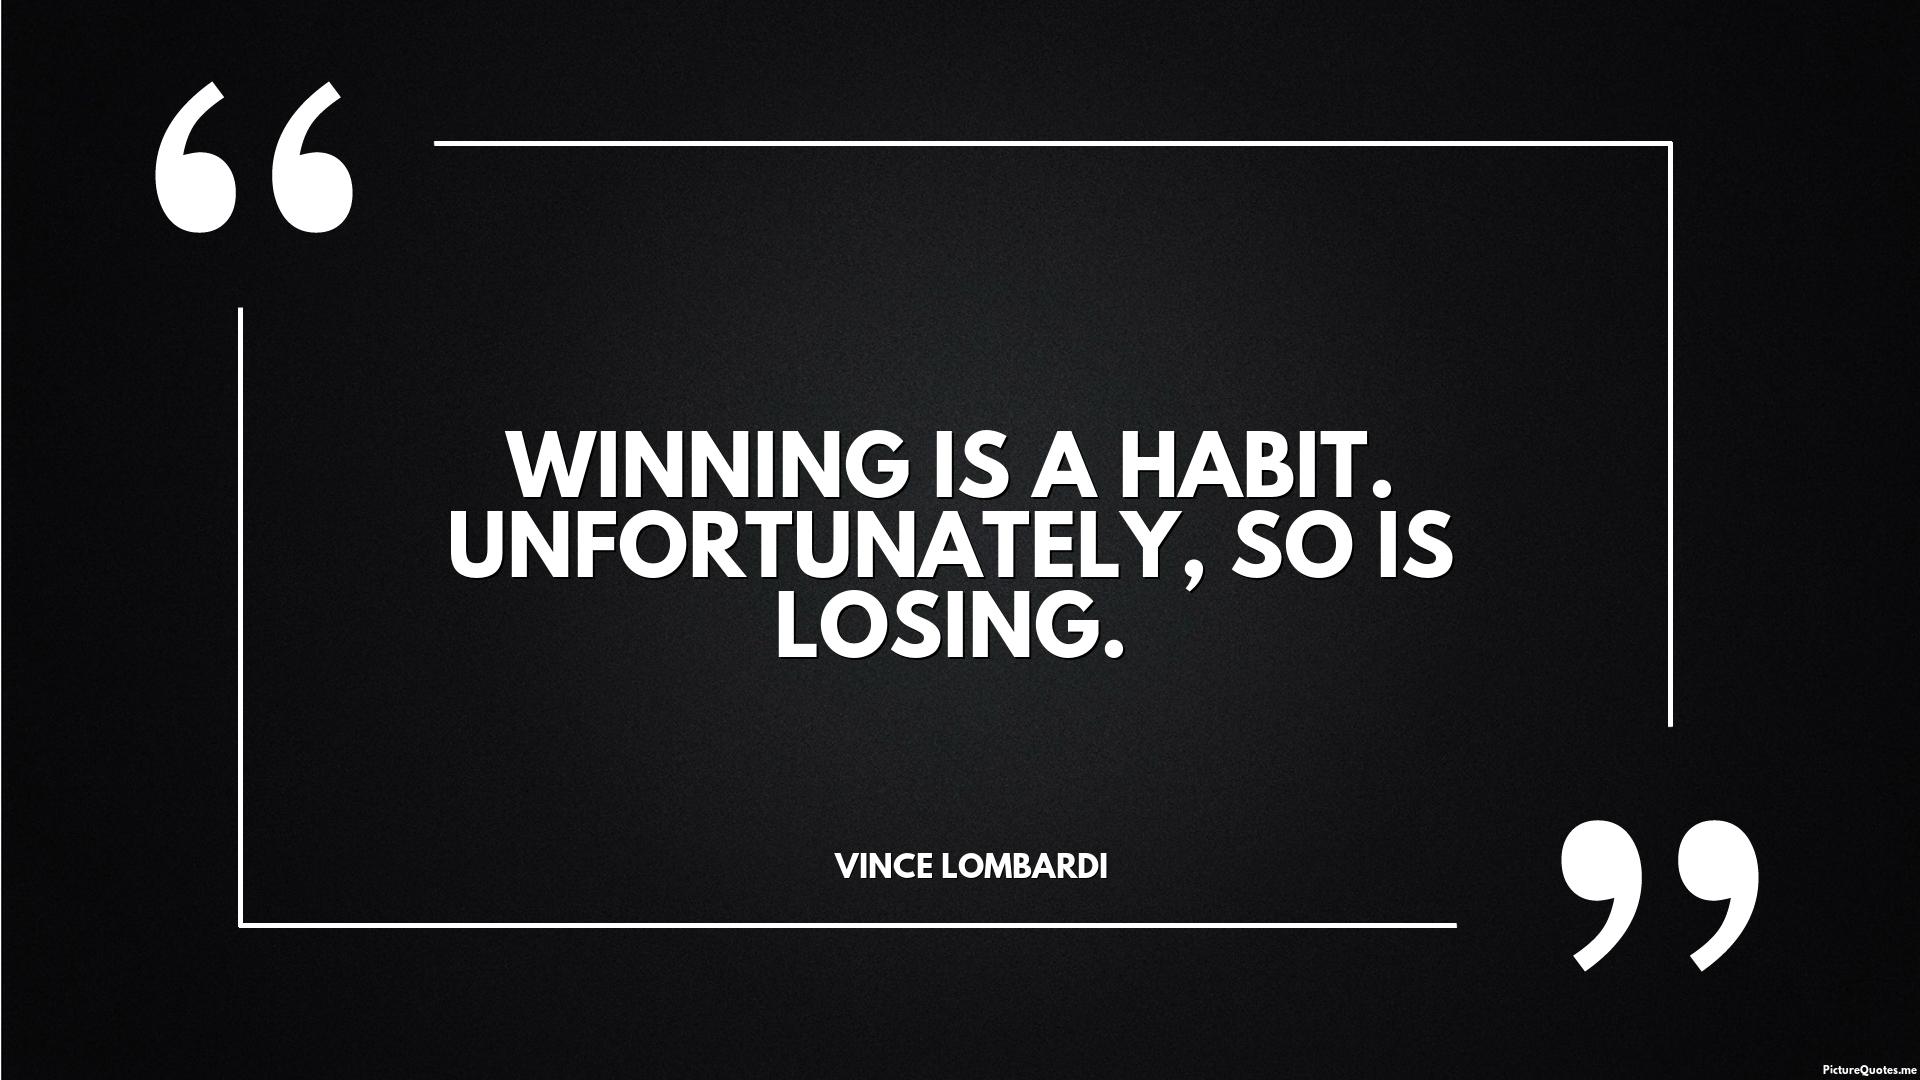 Winning Is A Habit Unfortunately So Is Losing Vince